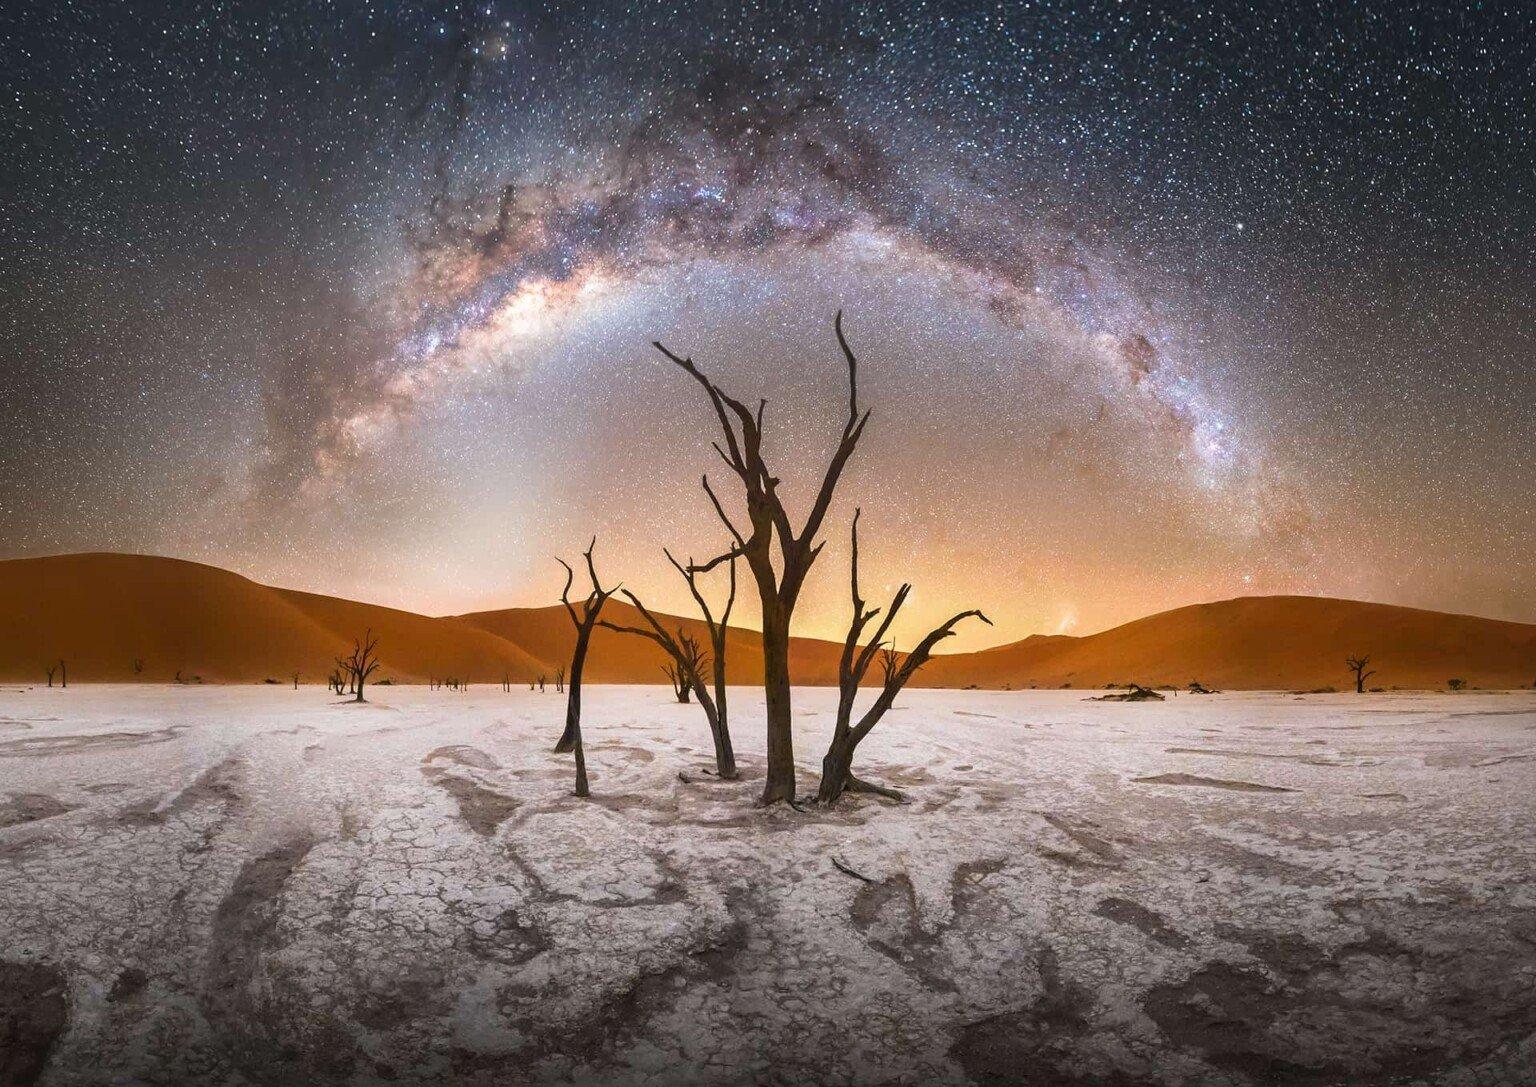 Milky-Way-at-Deadvlei-Namibia-1536×1087